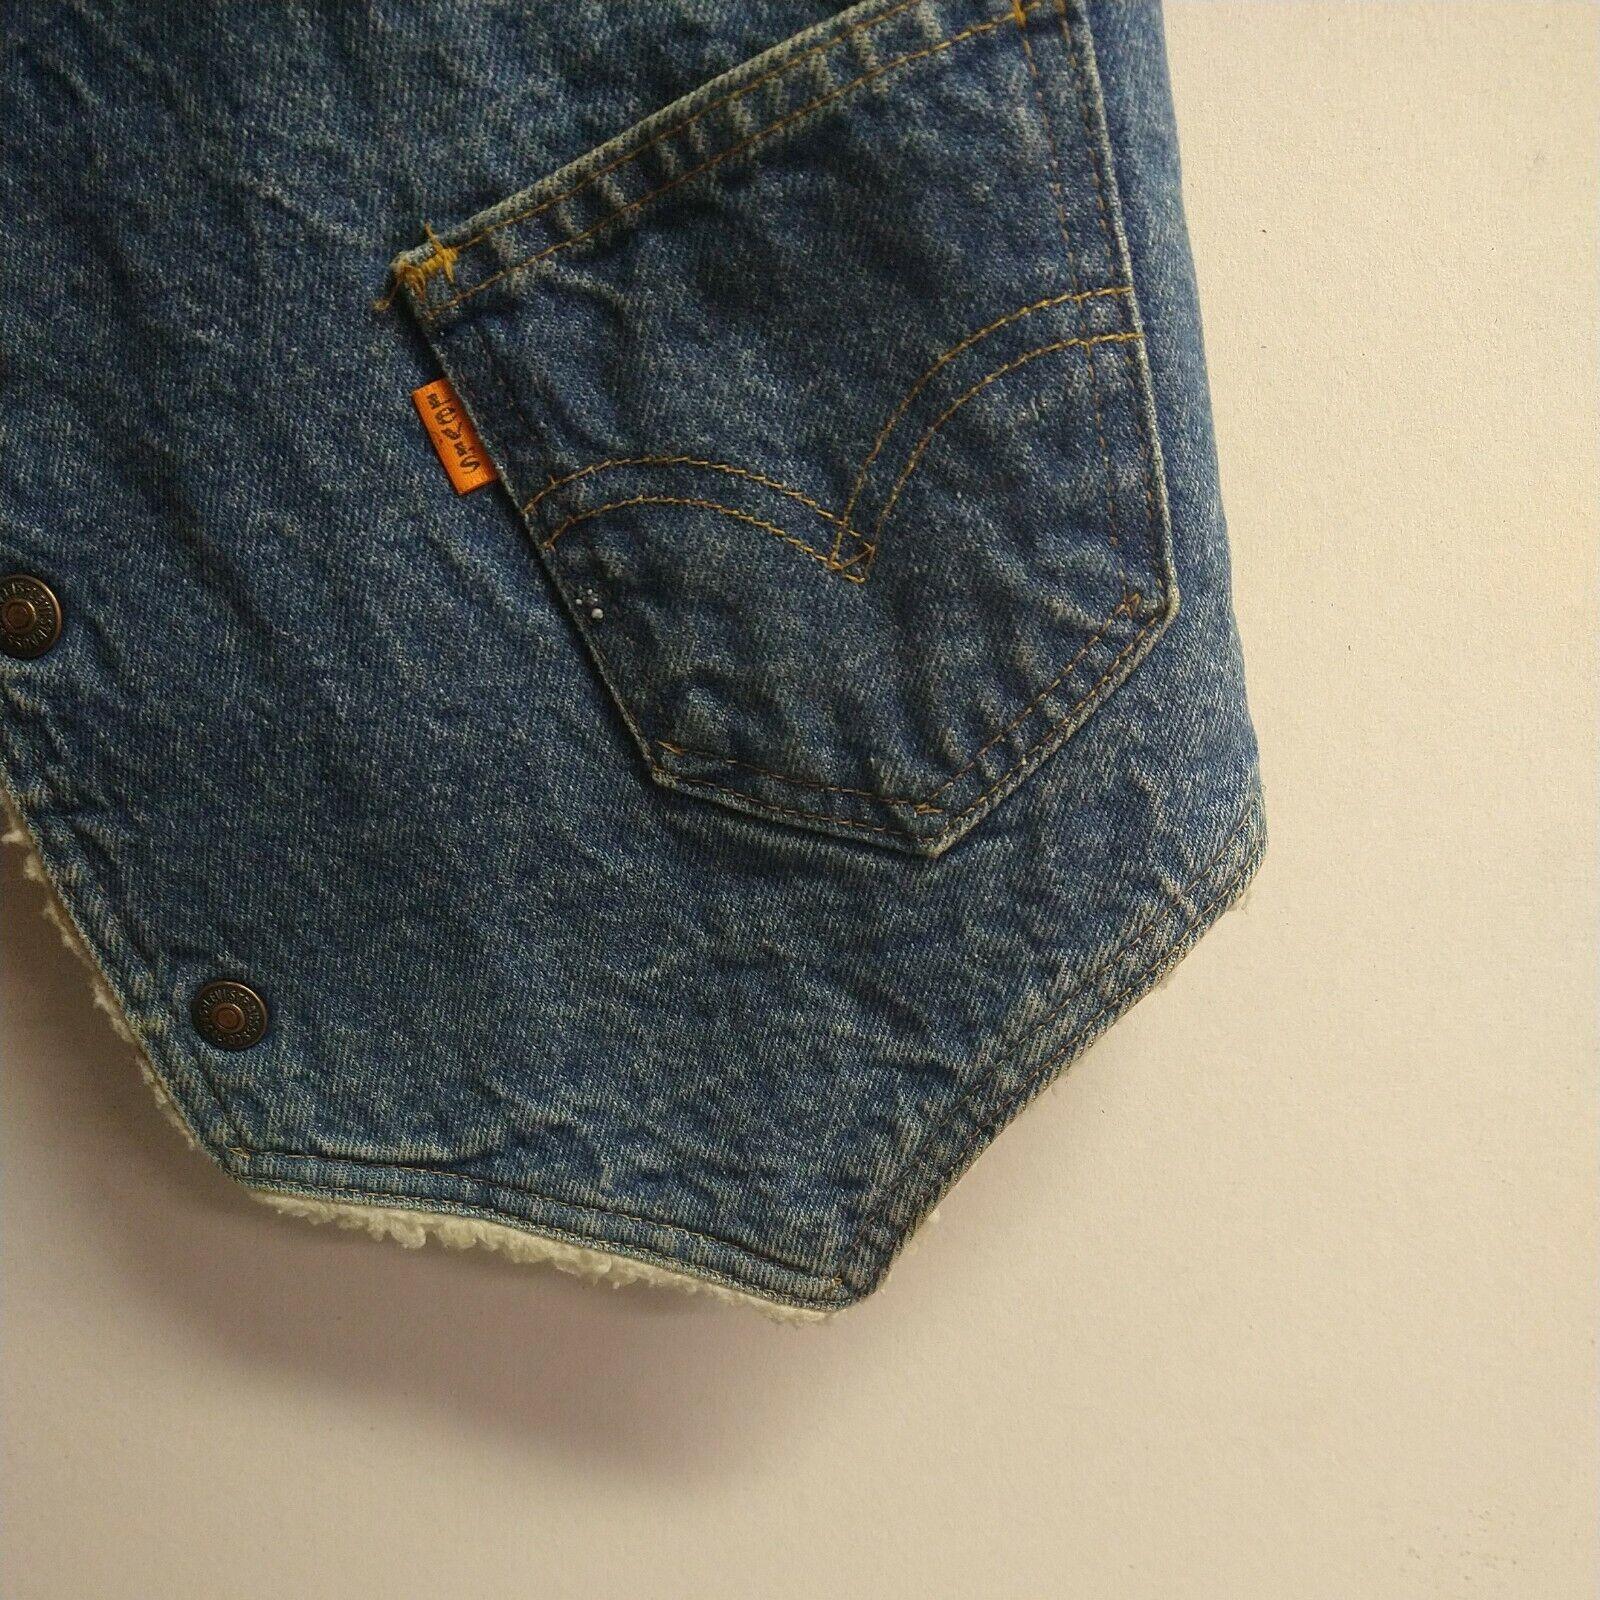 Levis vintage clothing Vest made in USA - image 2